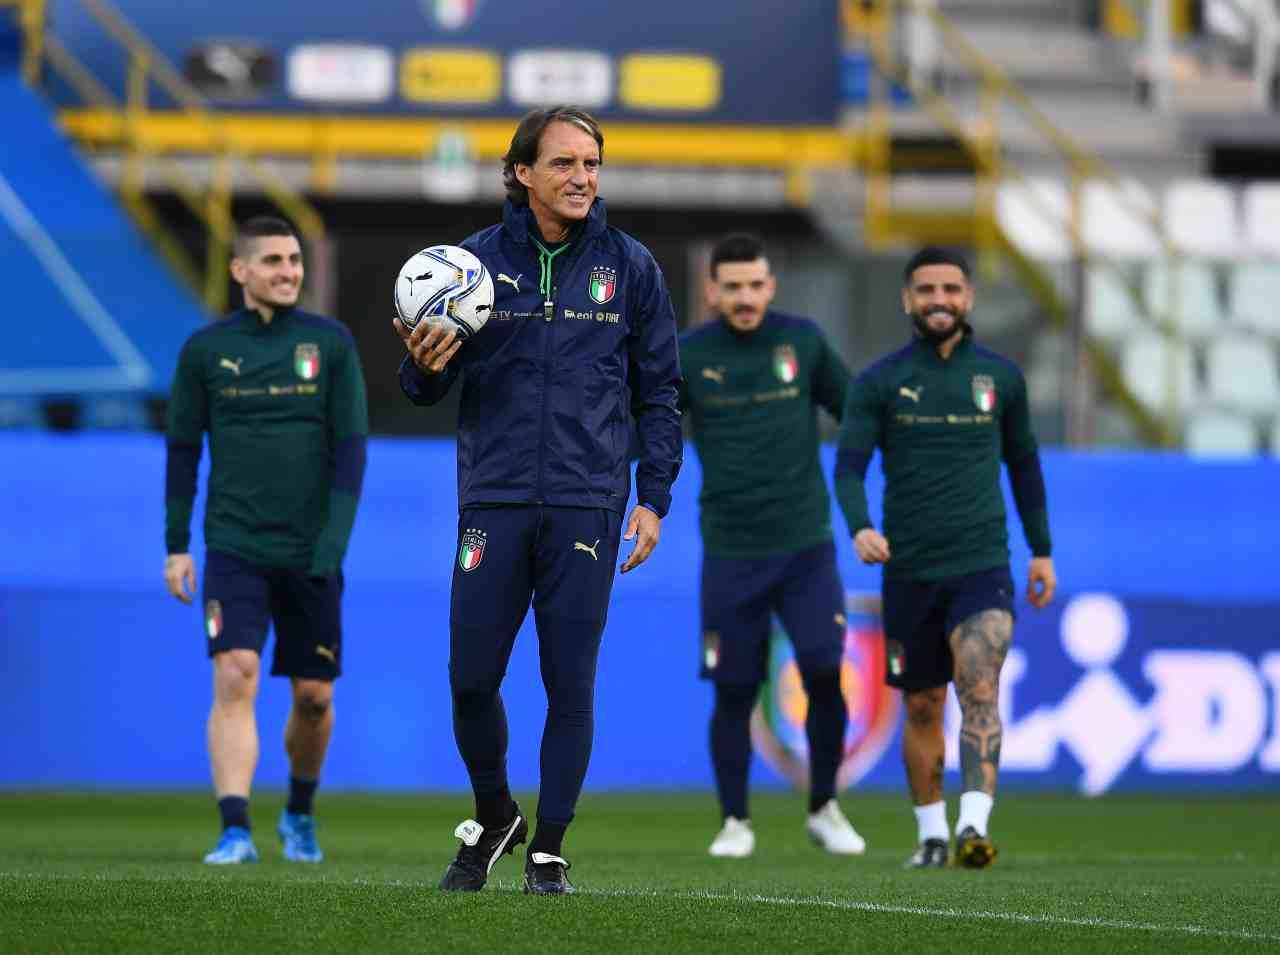 Inter Milan Juventus De Paul Collovati Donnarumma Conte Pioli Mancini Mourinho